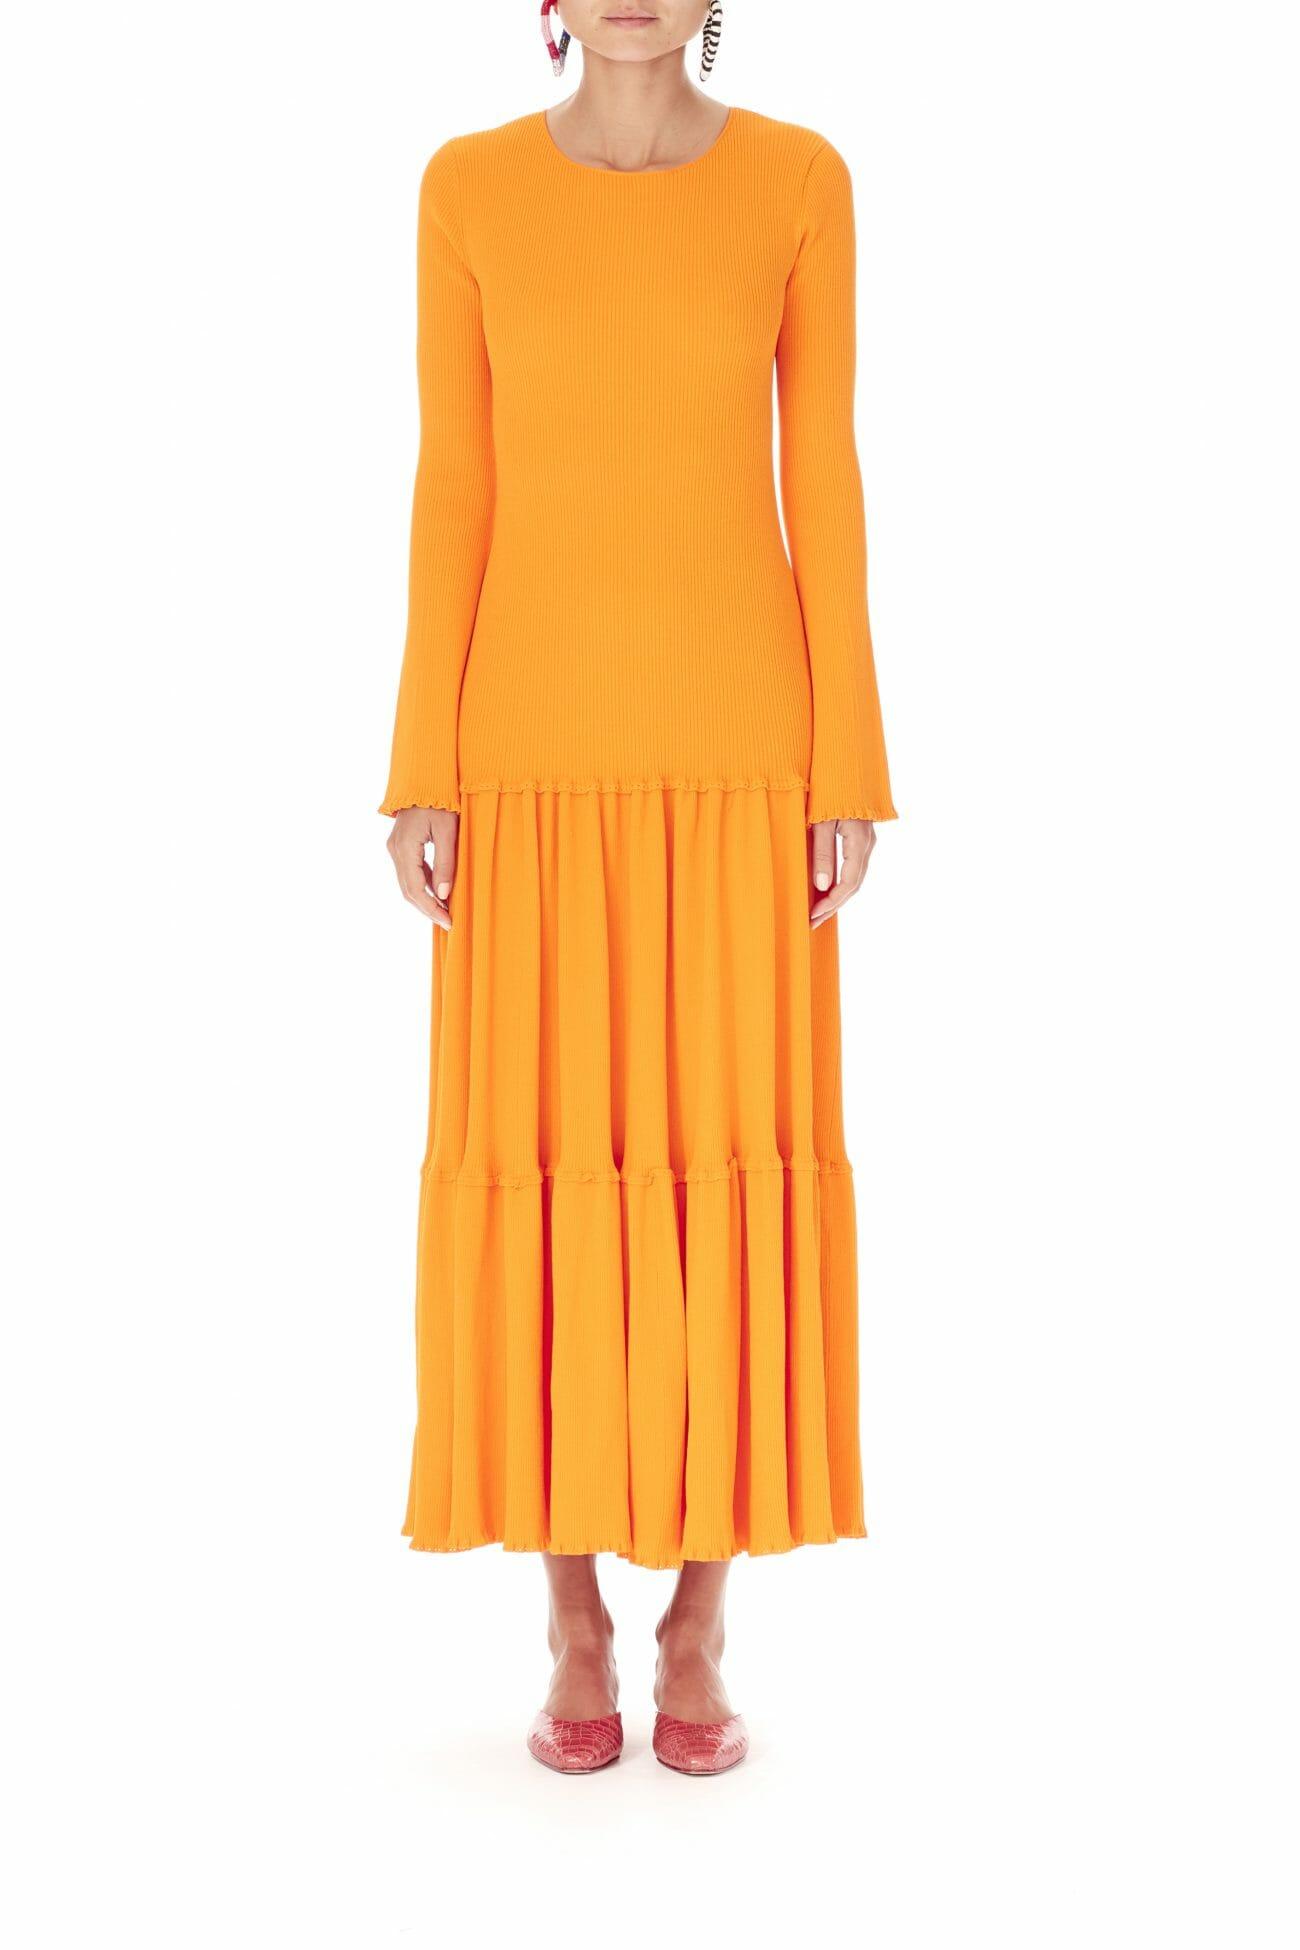 Carolina Herrera New York - Resort 2019 - Look 149-orange-dress-long-casual